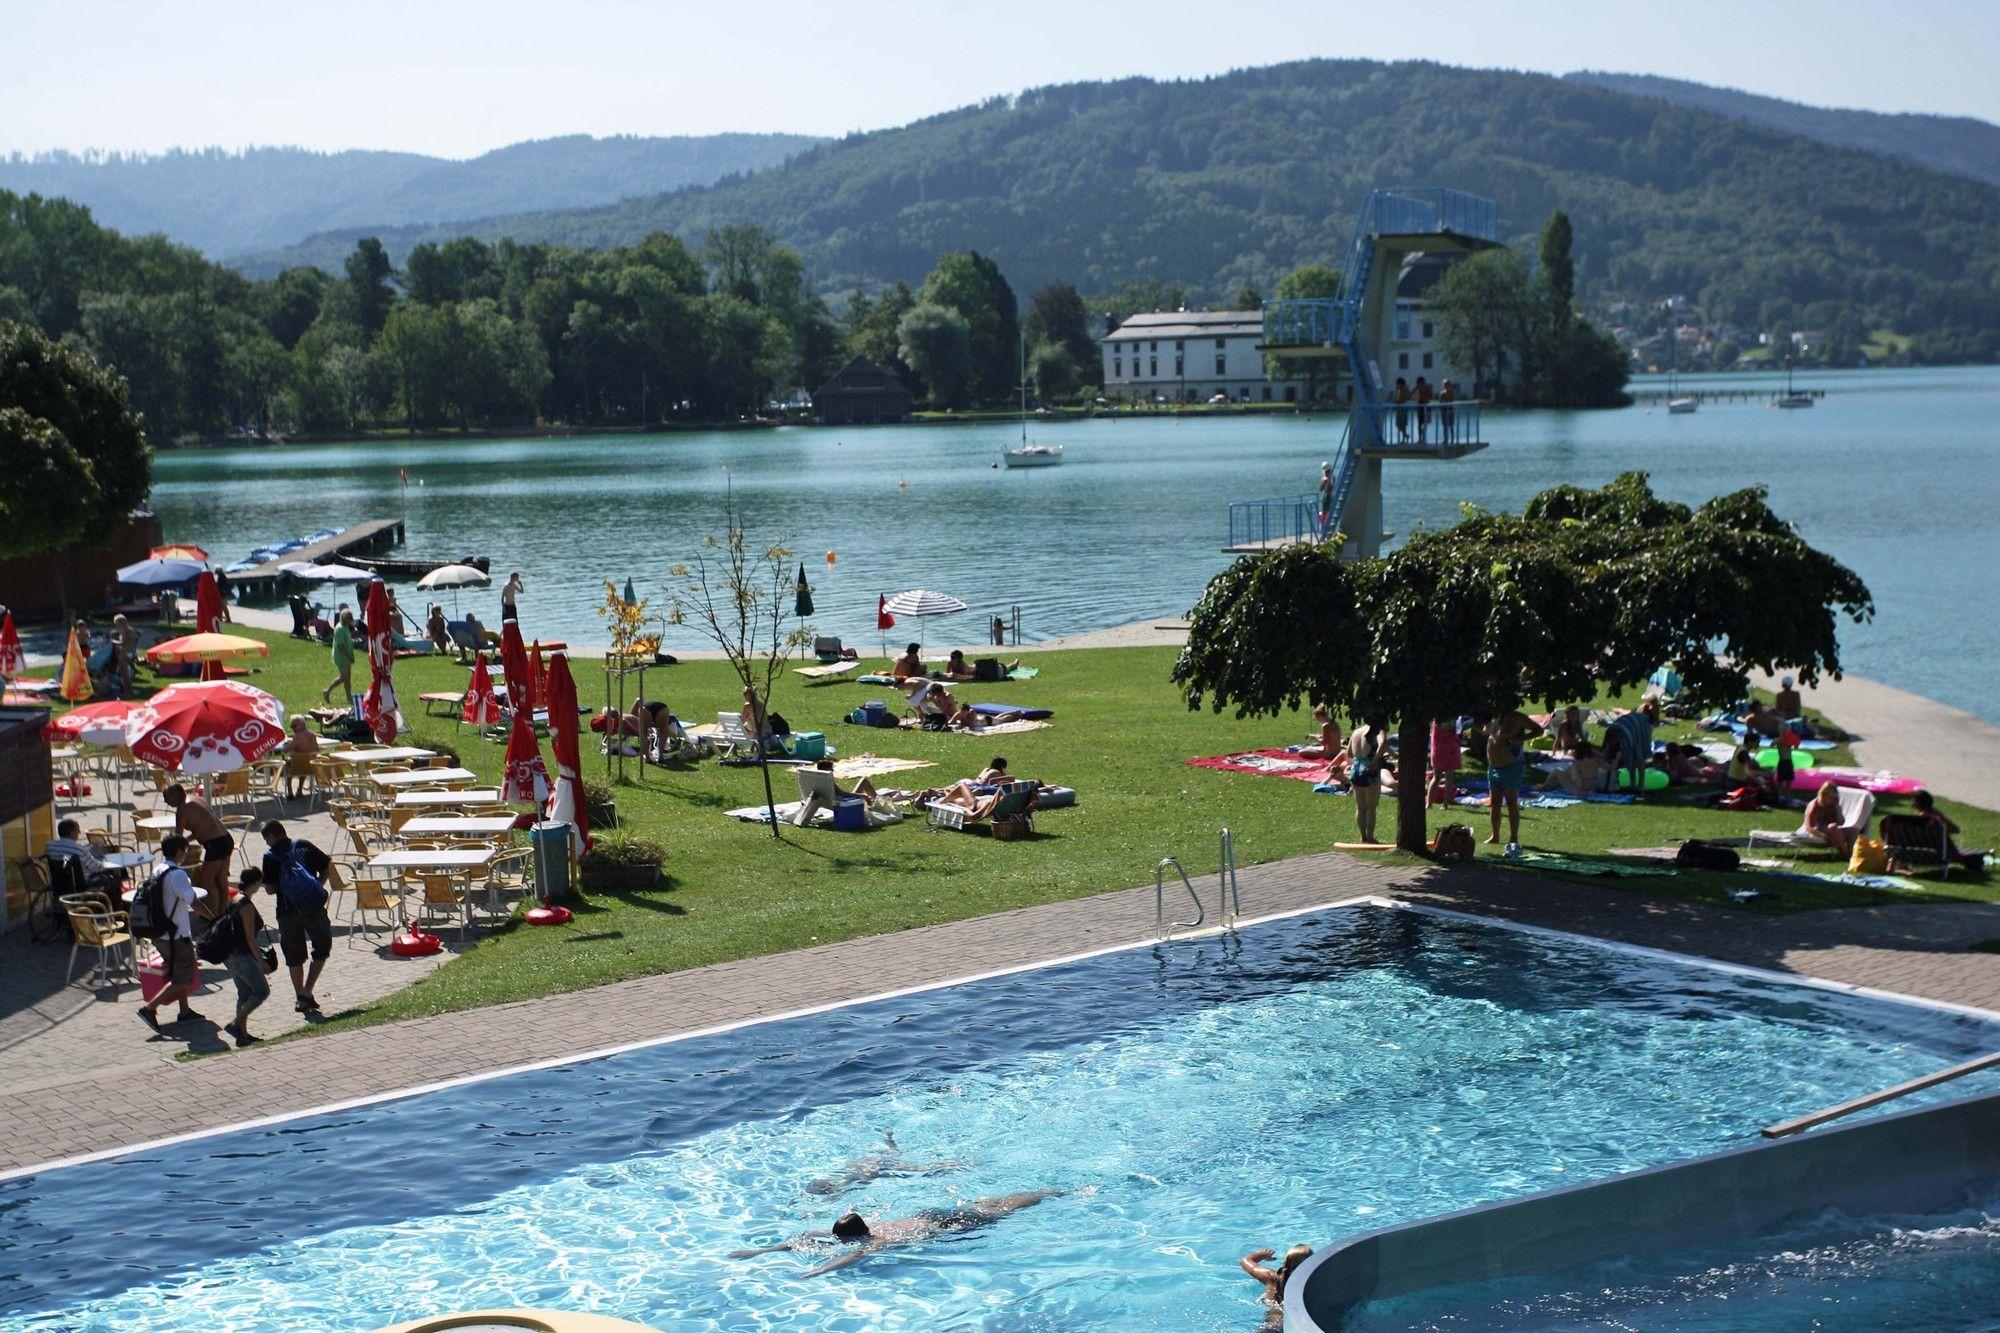 Seewalchen am Attersee, AT vacation rentals: Condos